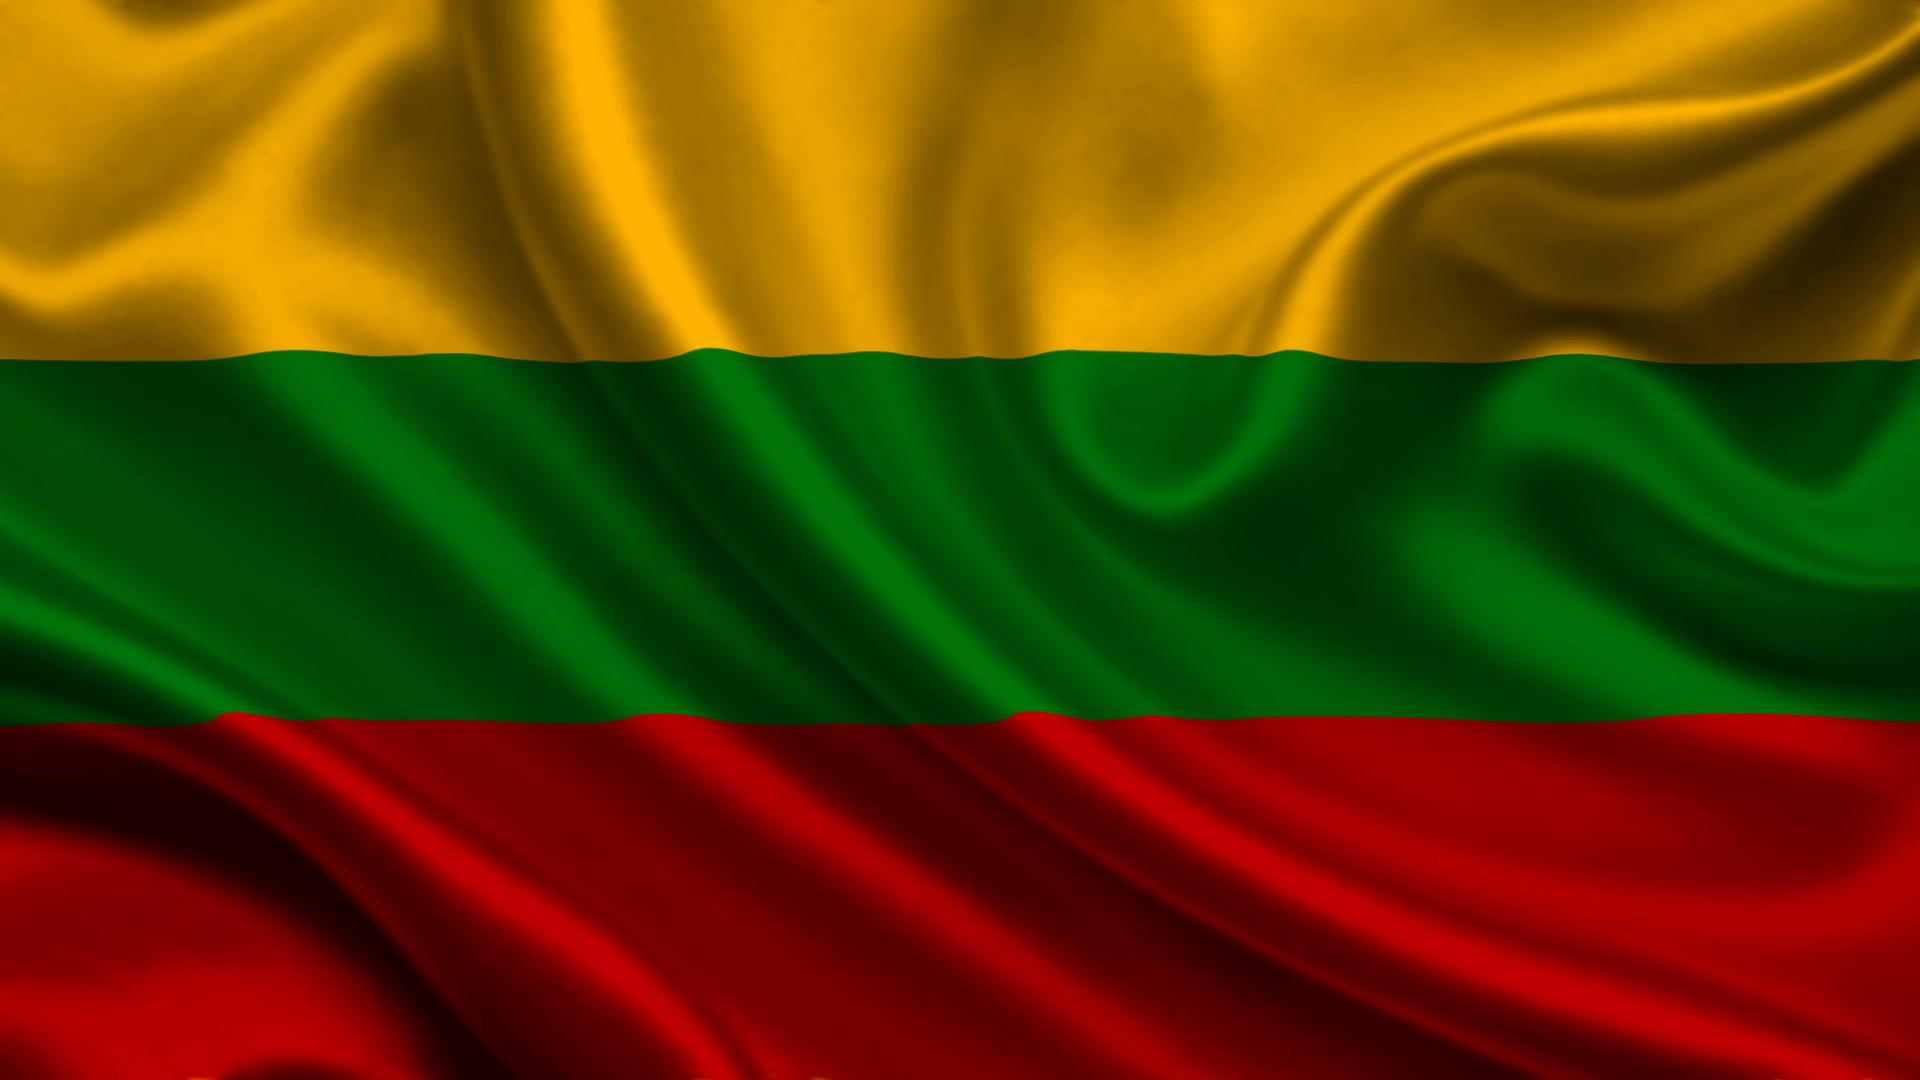 Lithuania Flag Wallpaper HD 52179 1920x1080px 1920x1080